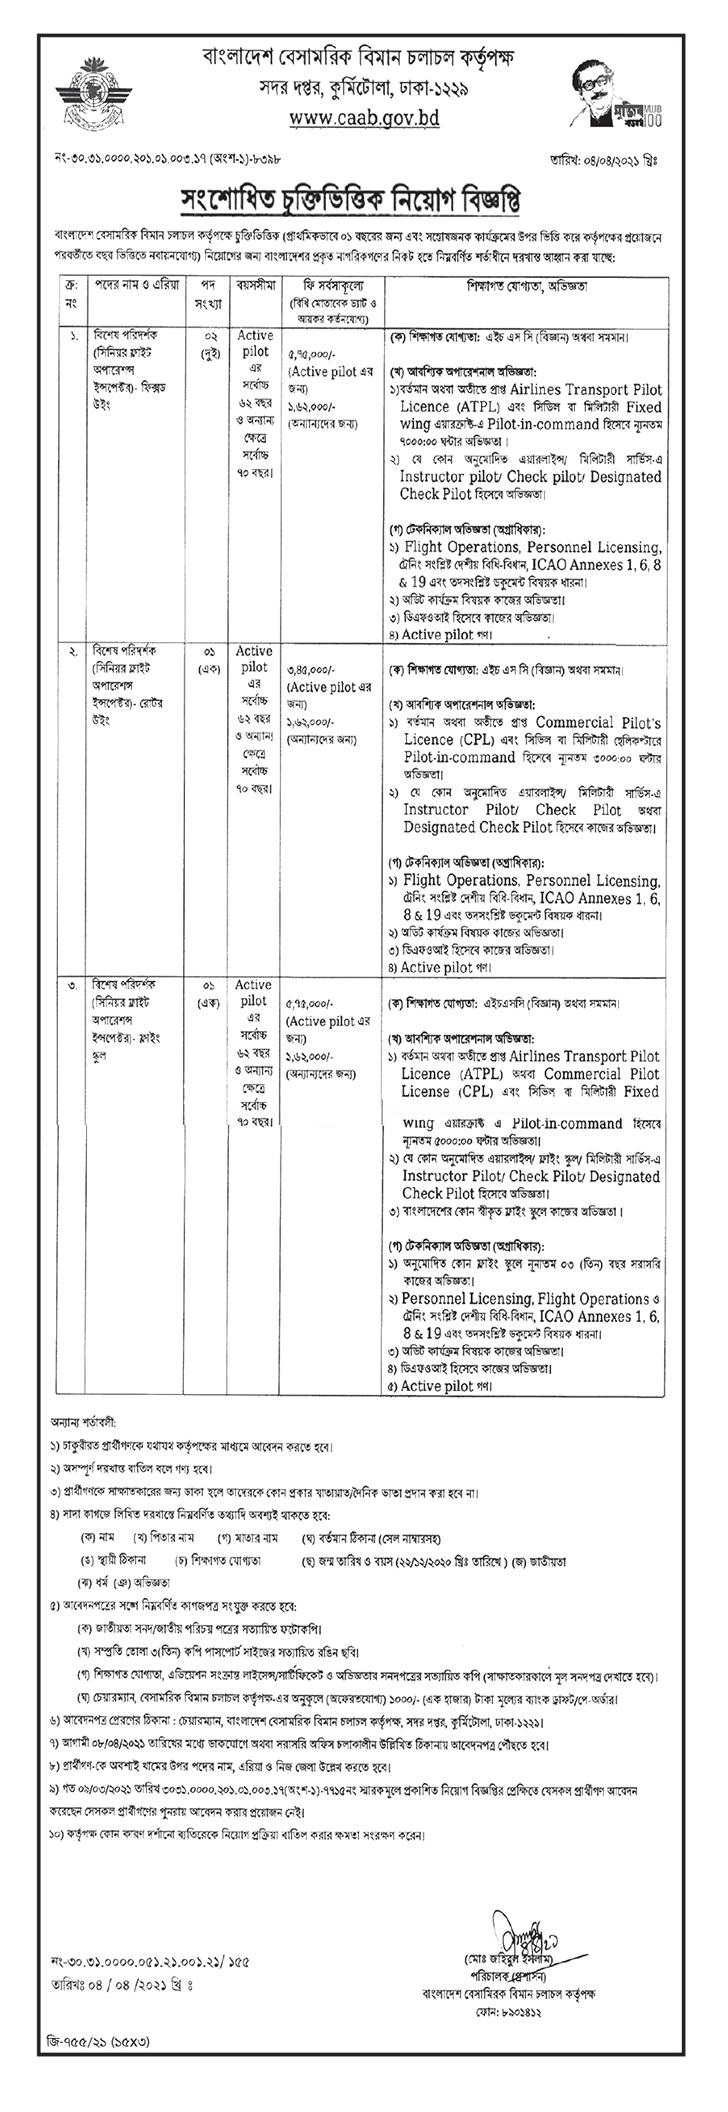 Civil Aviation Authority Recruitment Circular 2021 - বেসামরিক বিমান চলাচল কর্তৃপক্ষ নিয়োগ বিজ্ঞপ্তি ২০২১